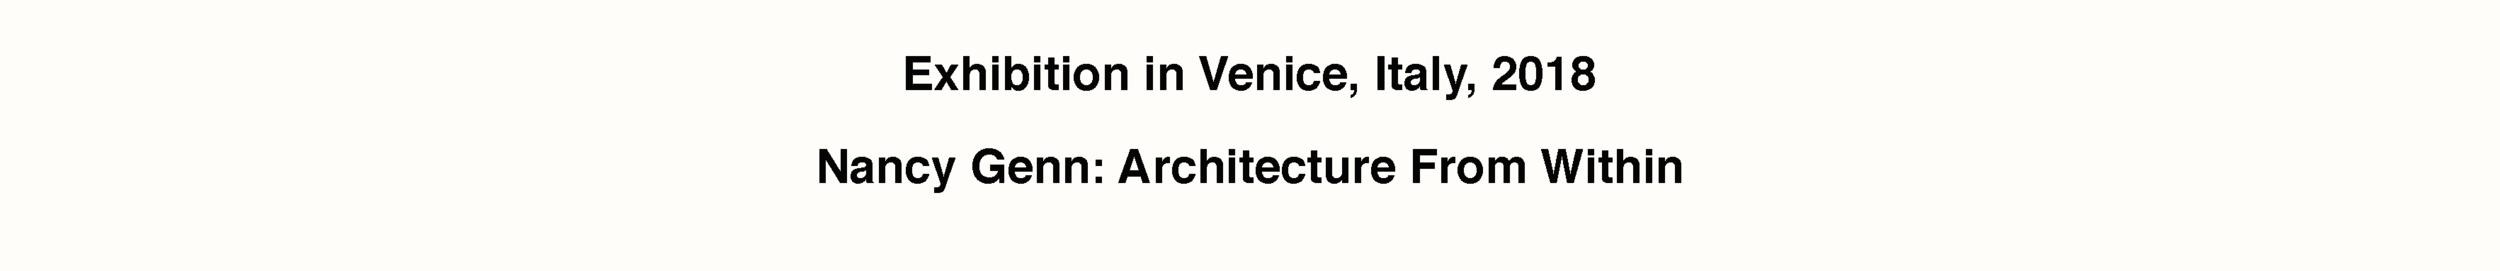 Venice exhibit.png